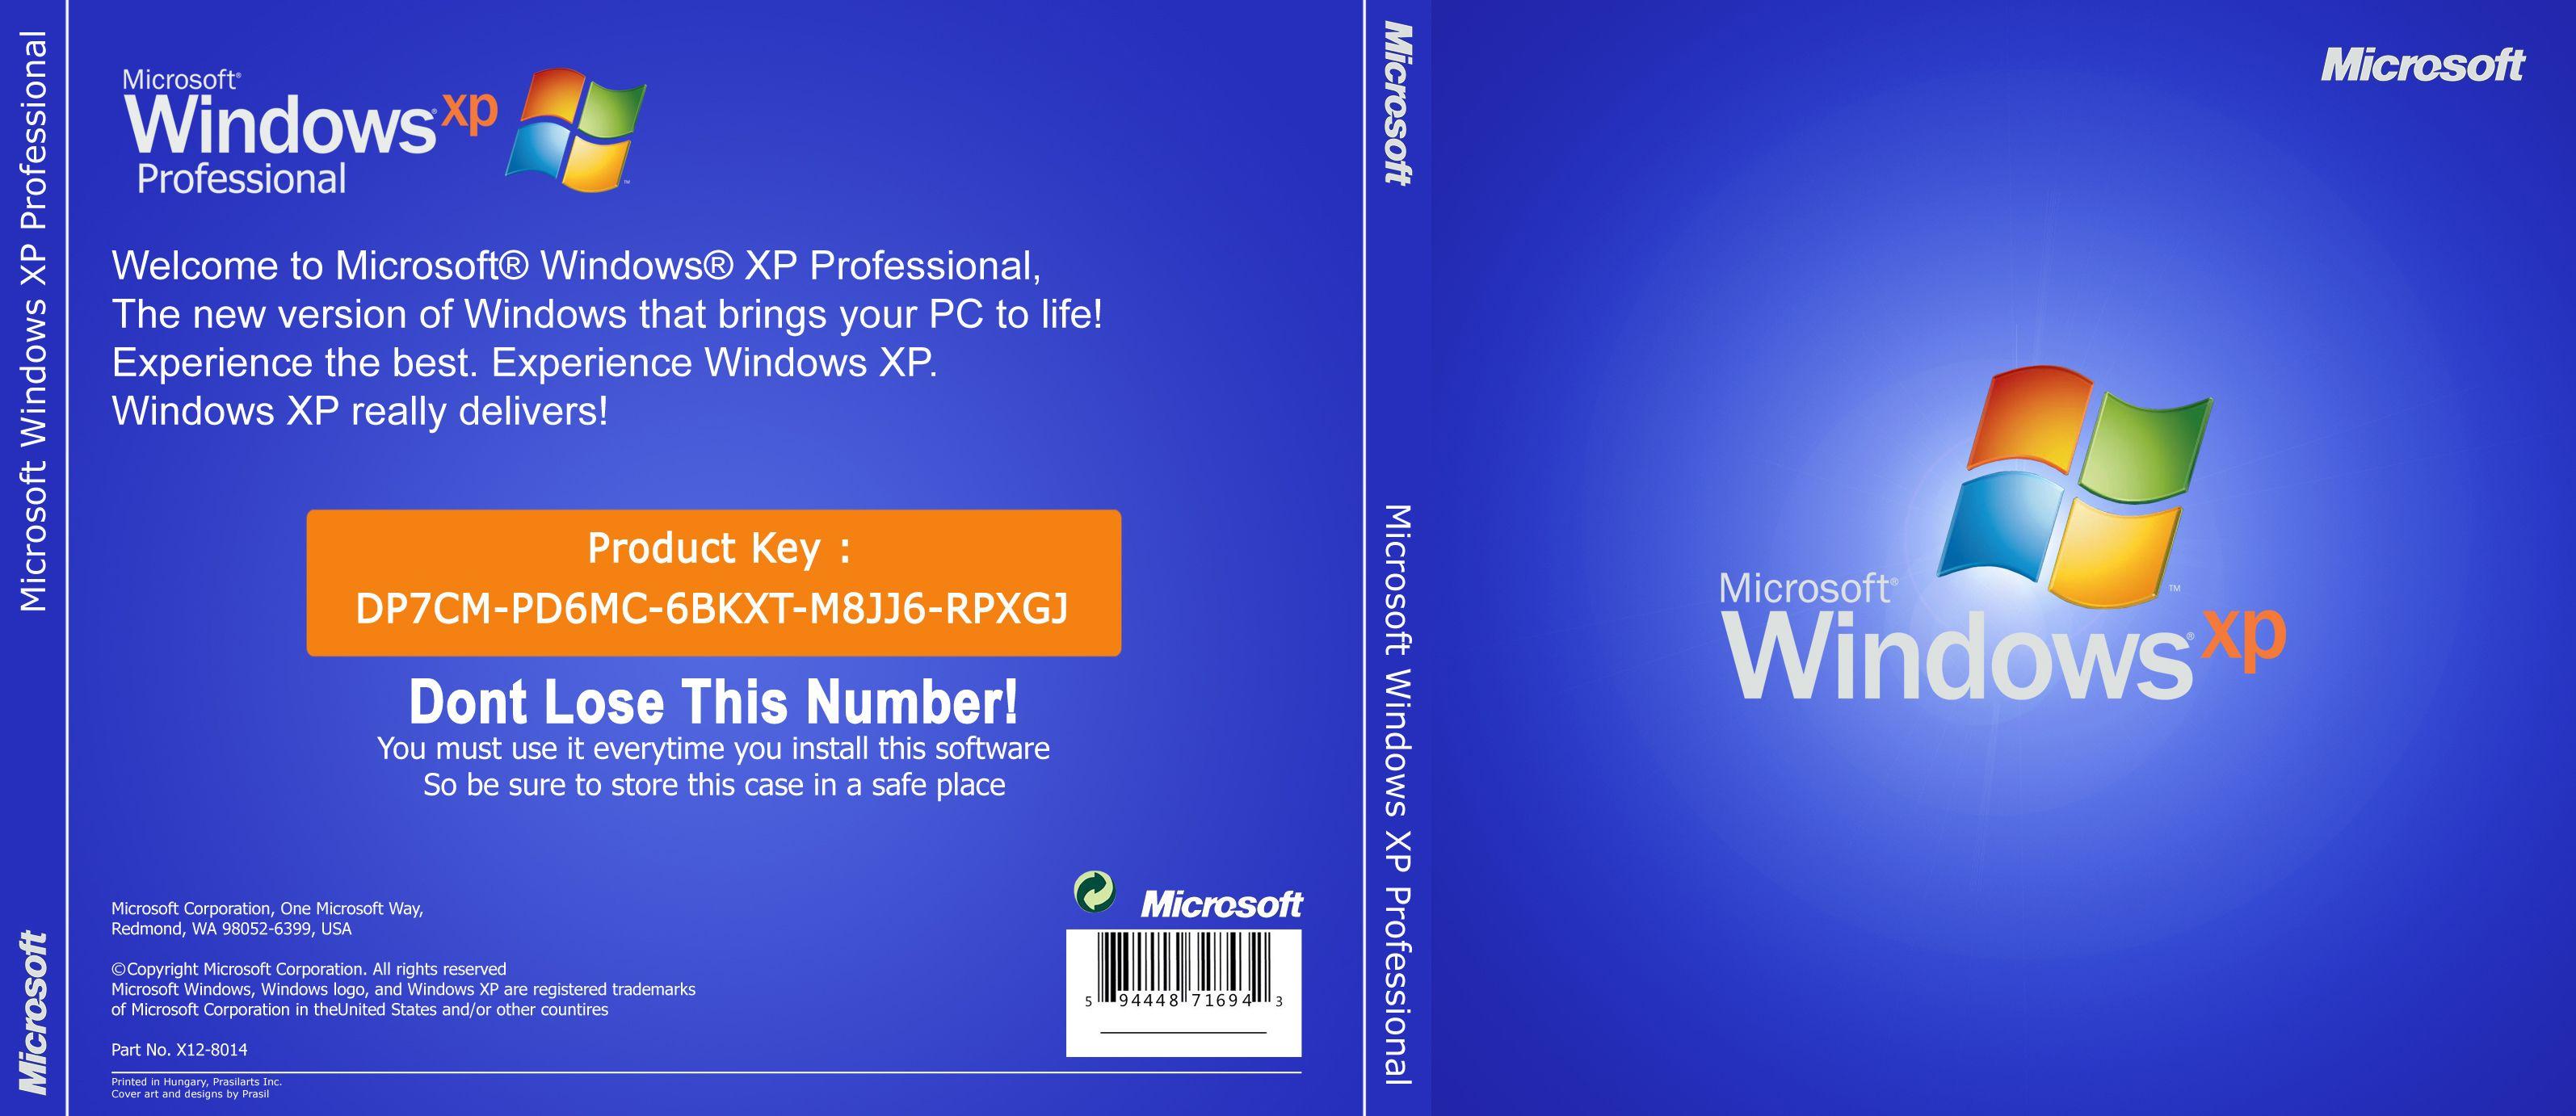 windows xp professional cd download